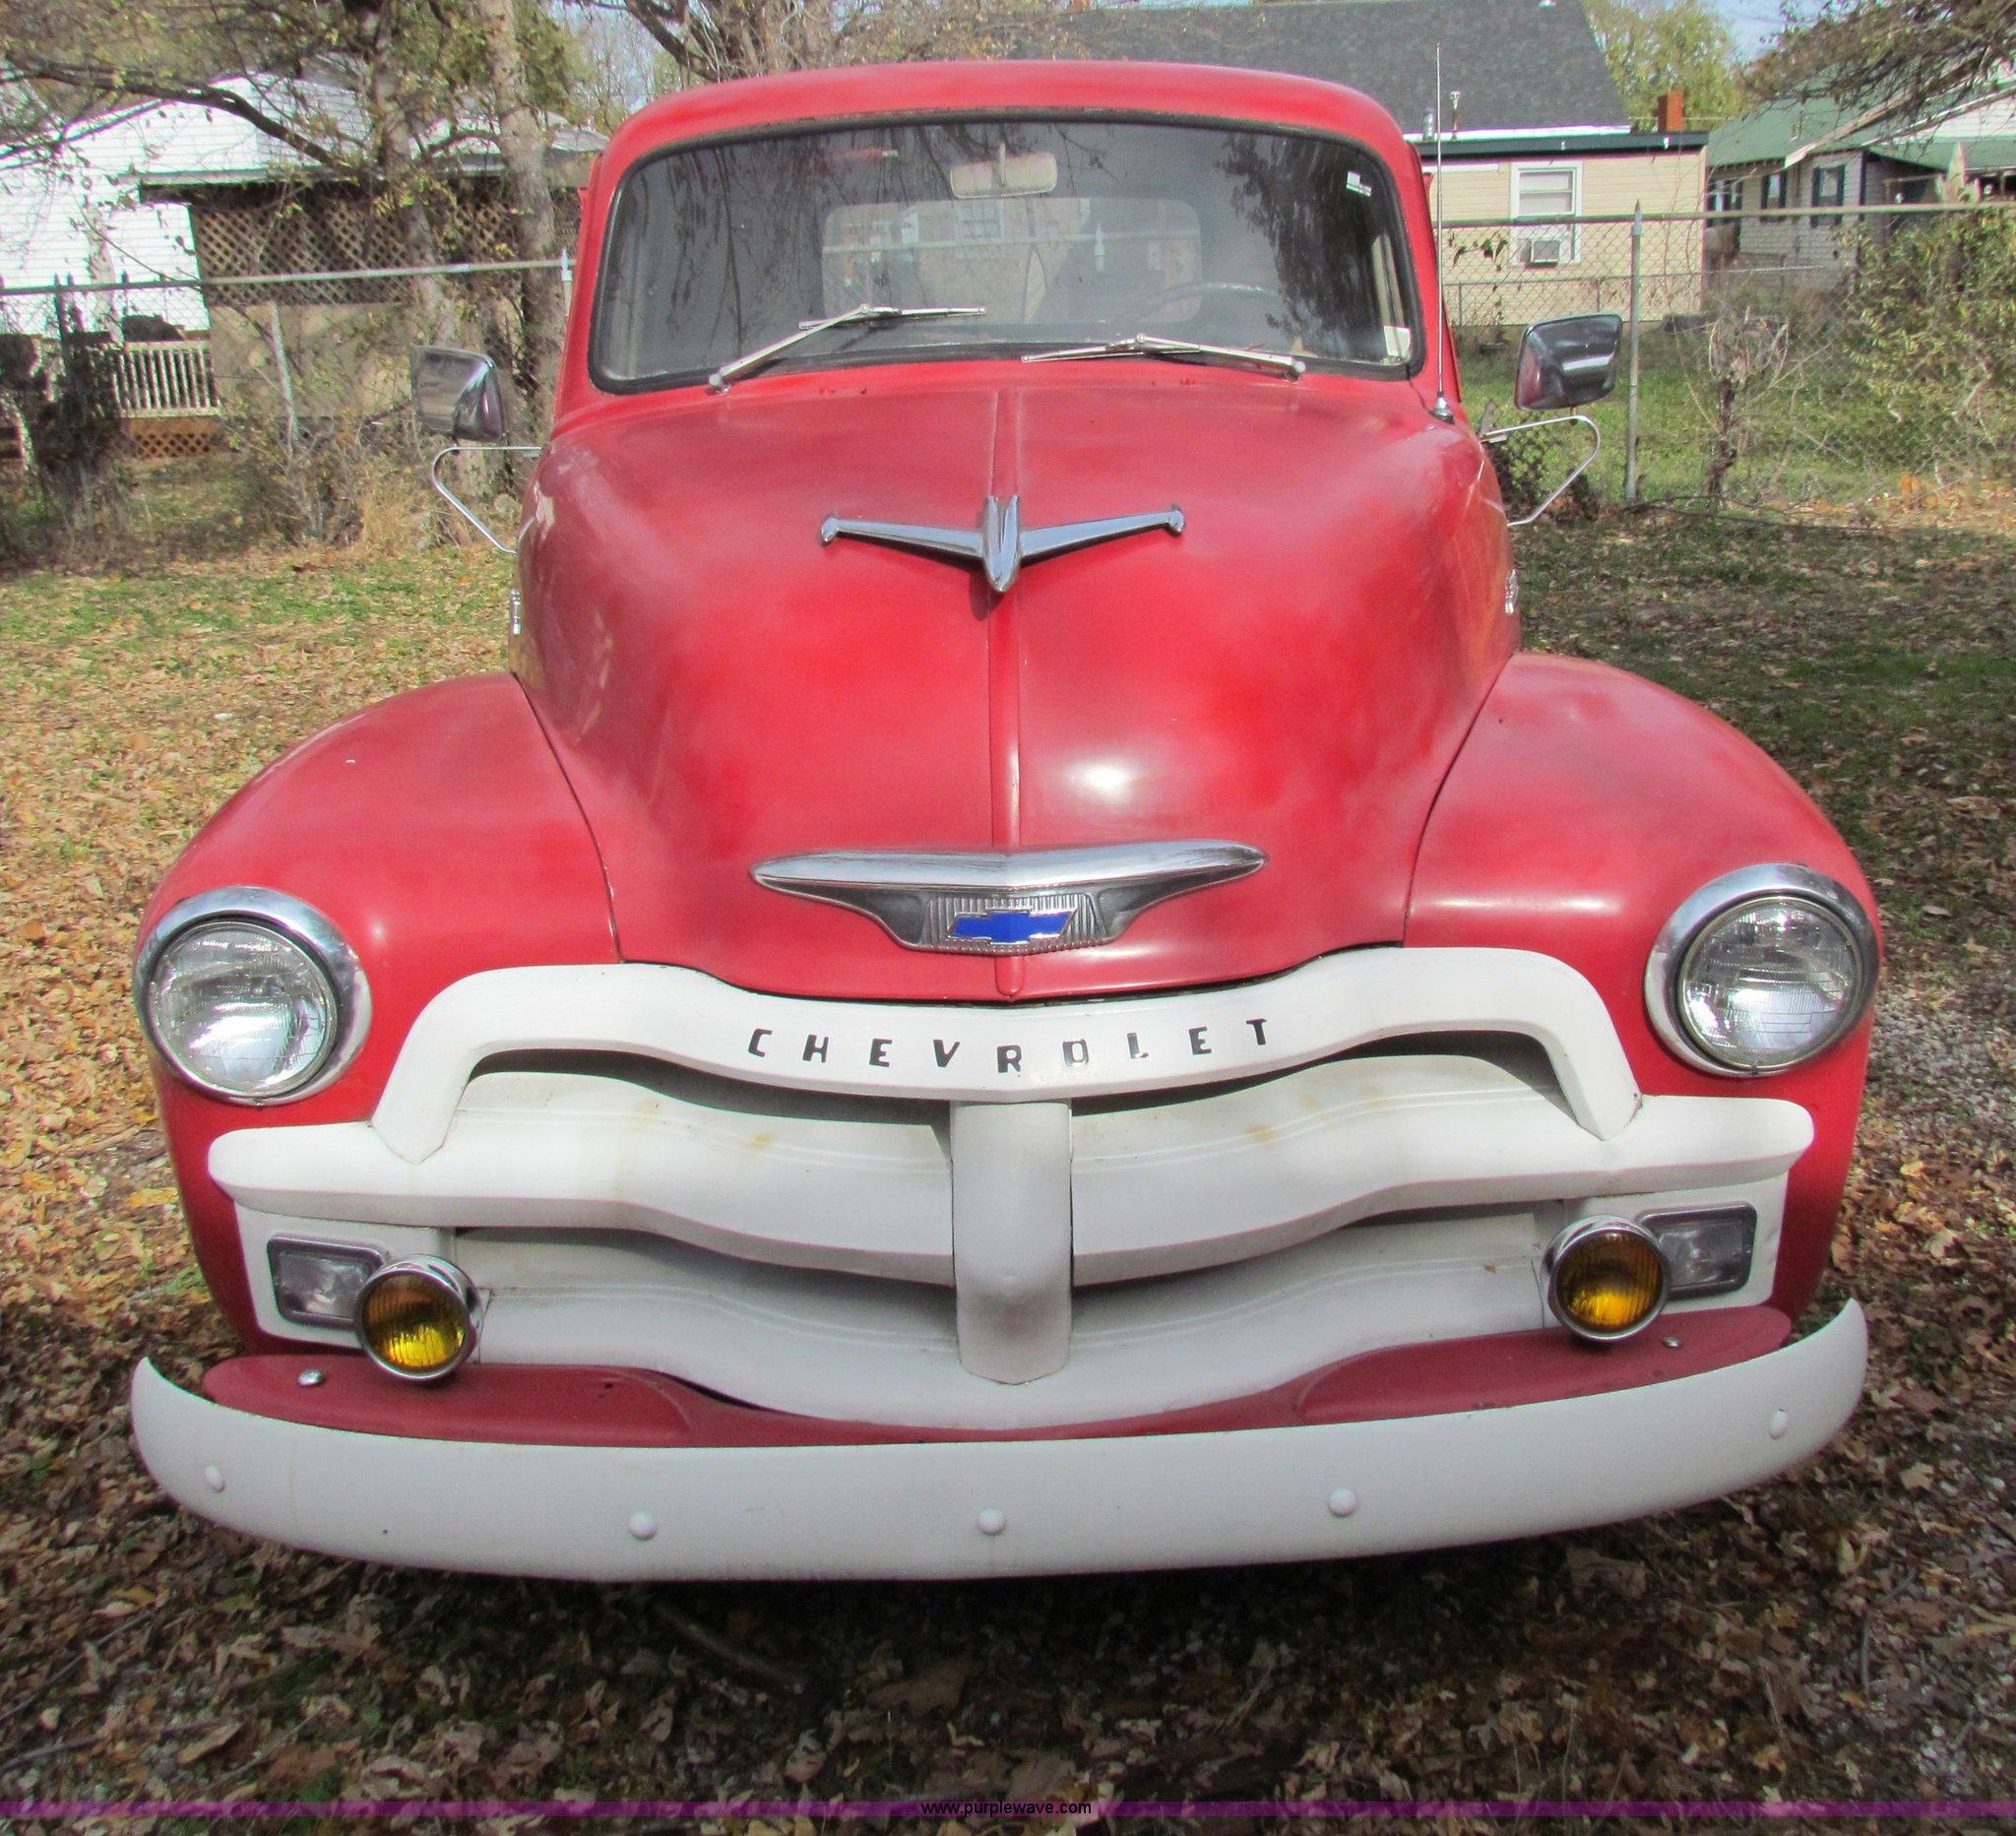 1954 Chevrolet 3100 Pickup Truck Item H7282 Sold Decemb Full Size In New Window